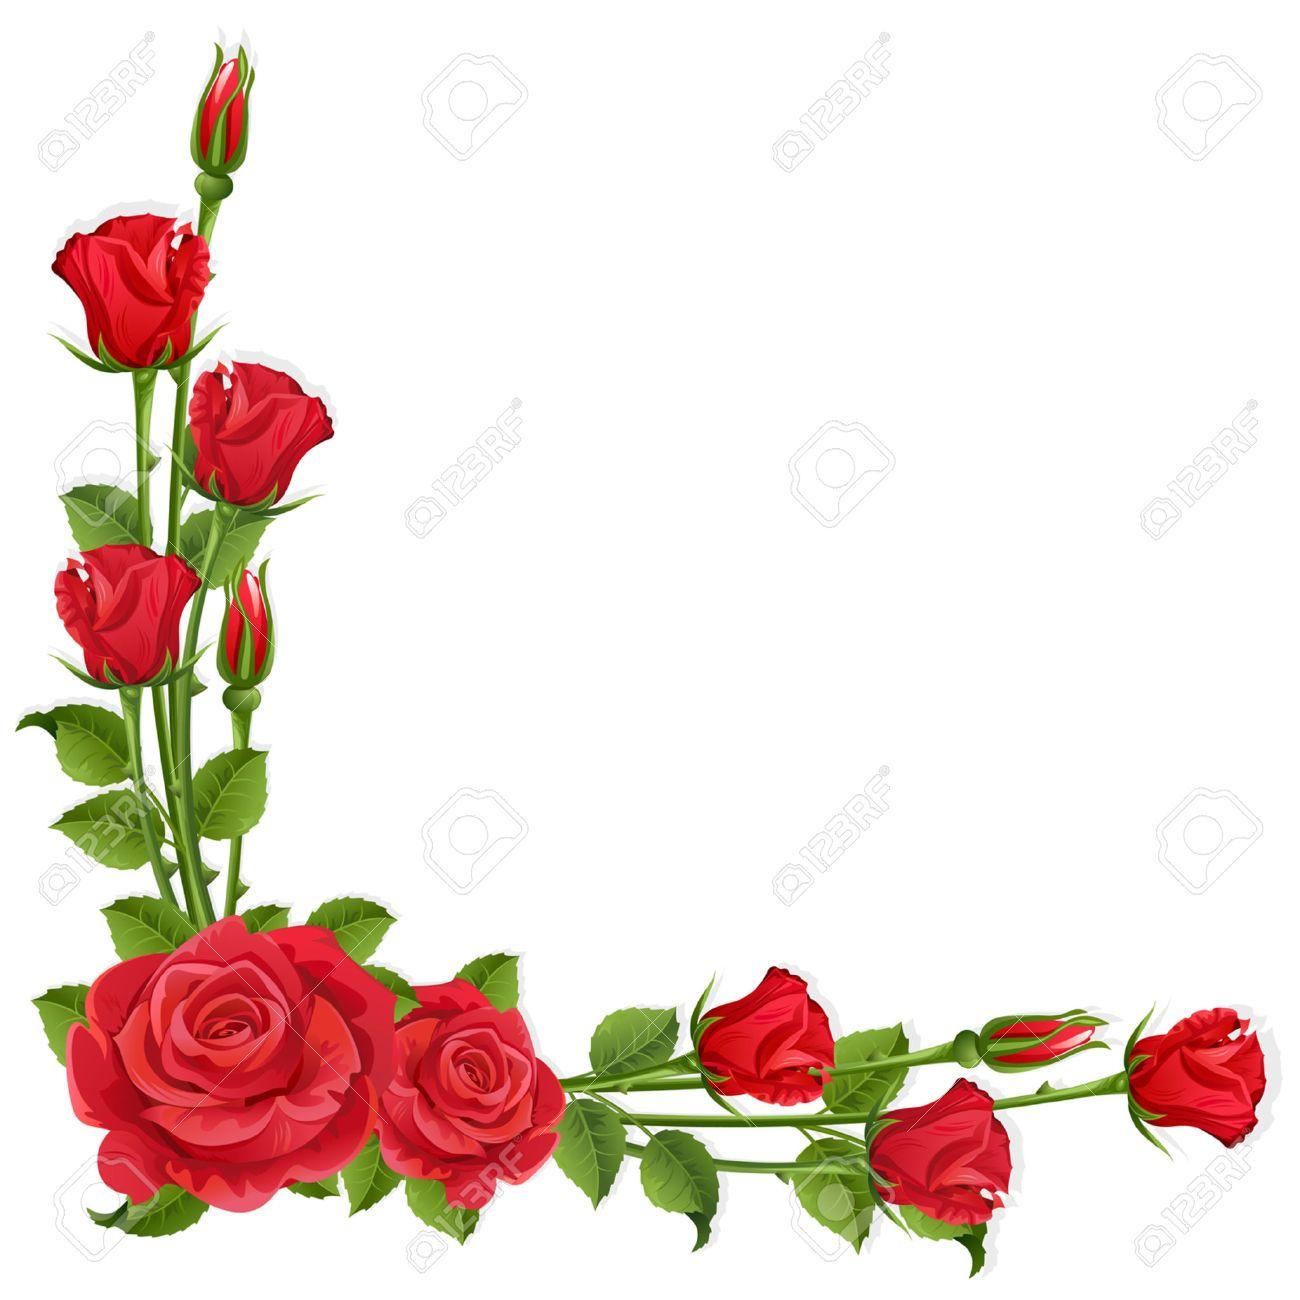 Rose flower border clipart clipart royalty free stock Stock Vector | Oklevél | Red roses, Rose flower wallpaper, Flower ... clipart royalty free stock